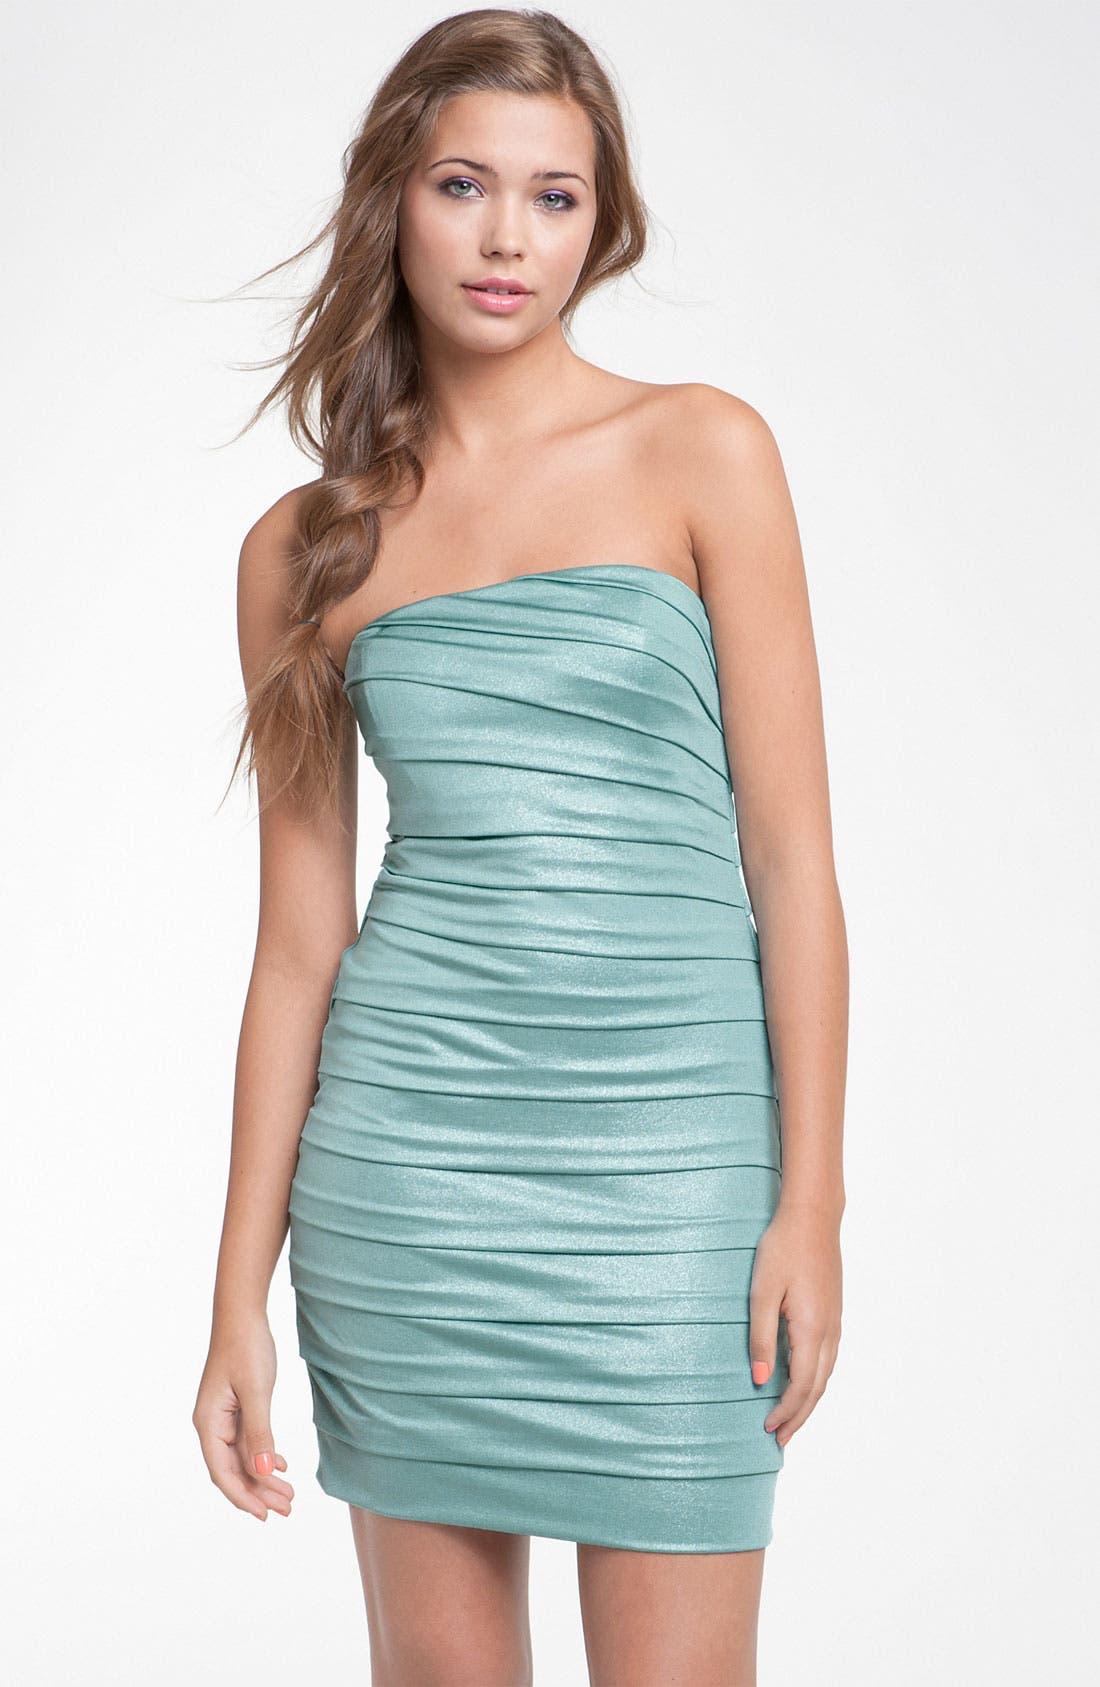 Alternate Image 1 Selected - Speechless Pleated Strapless Dress (Juniors)